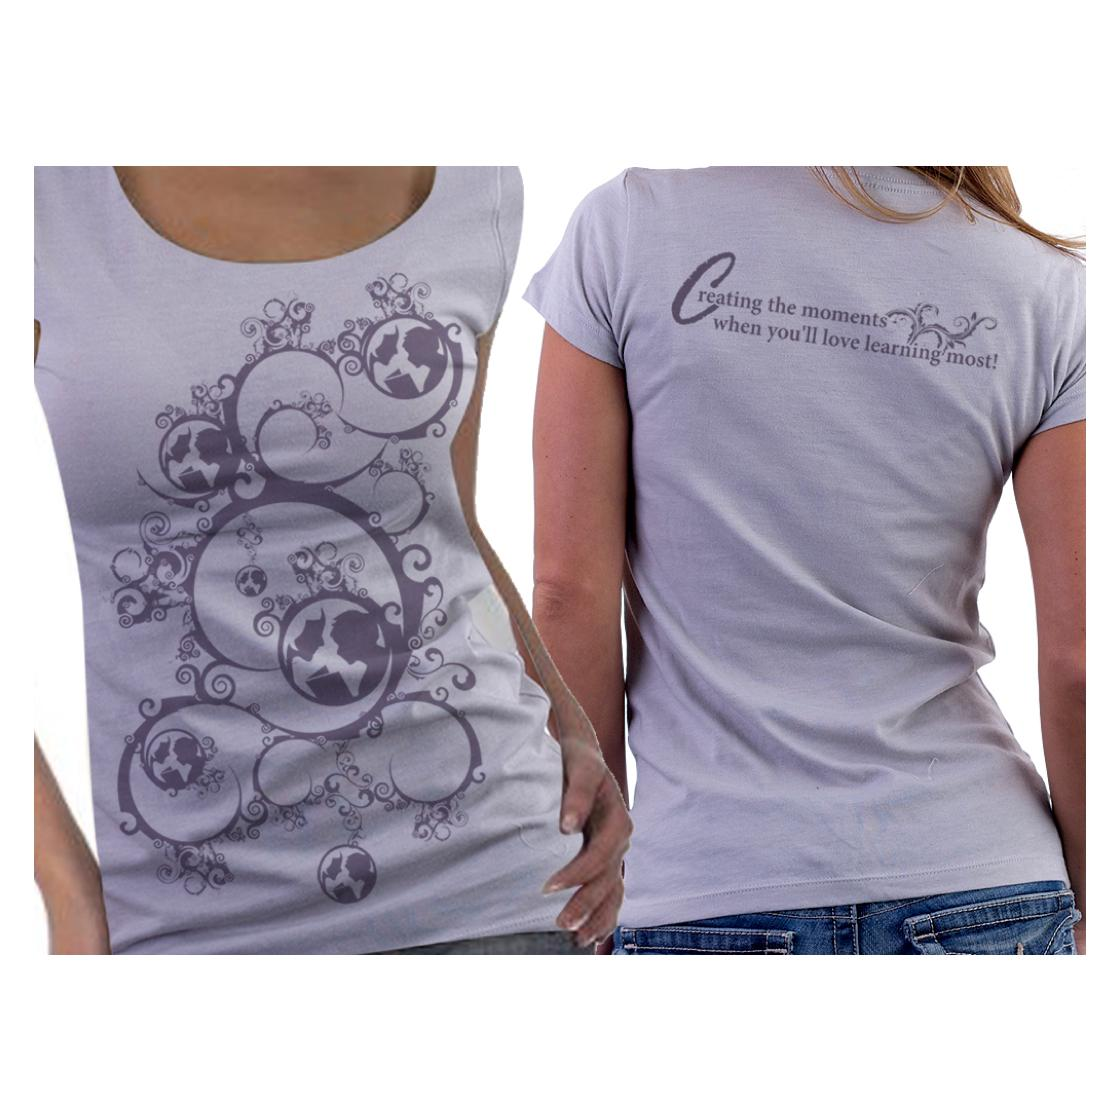 crowdspring t-shirt design by akosiaki